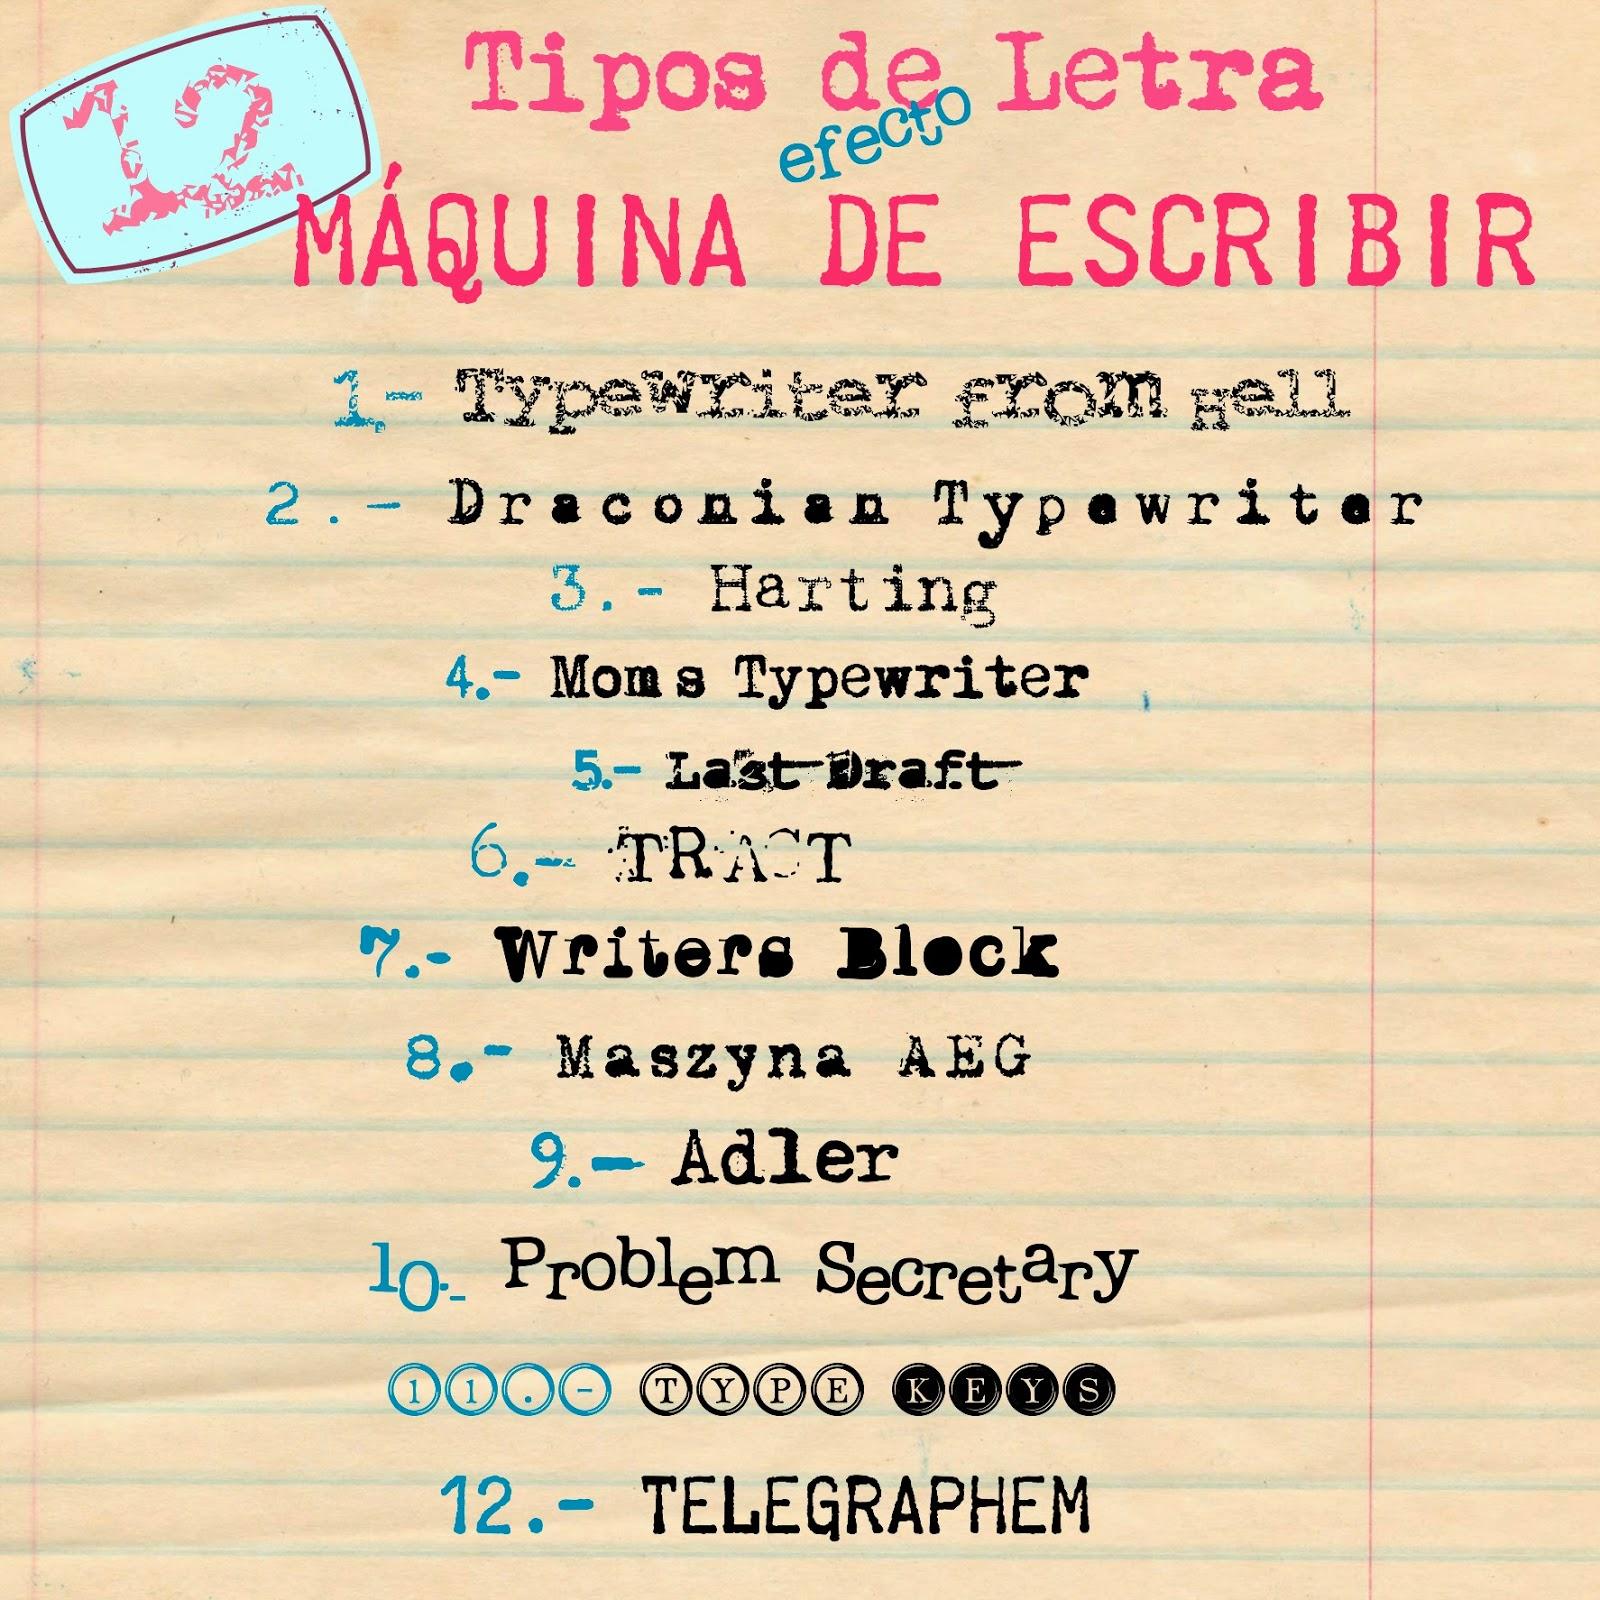 Pitis And Lilus Tipos De Letra Tipografia Efecto Maquina